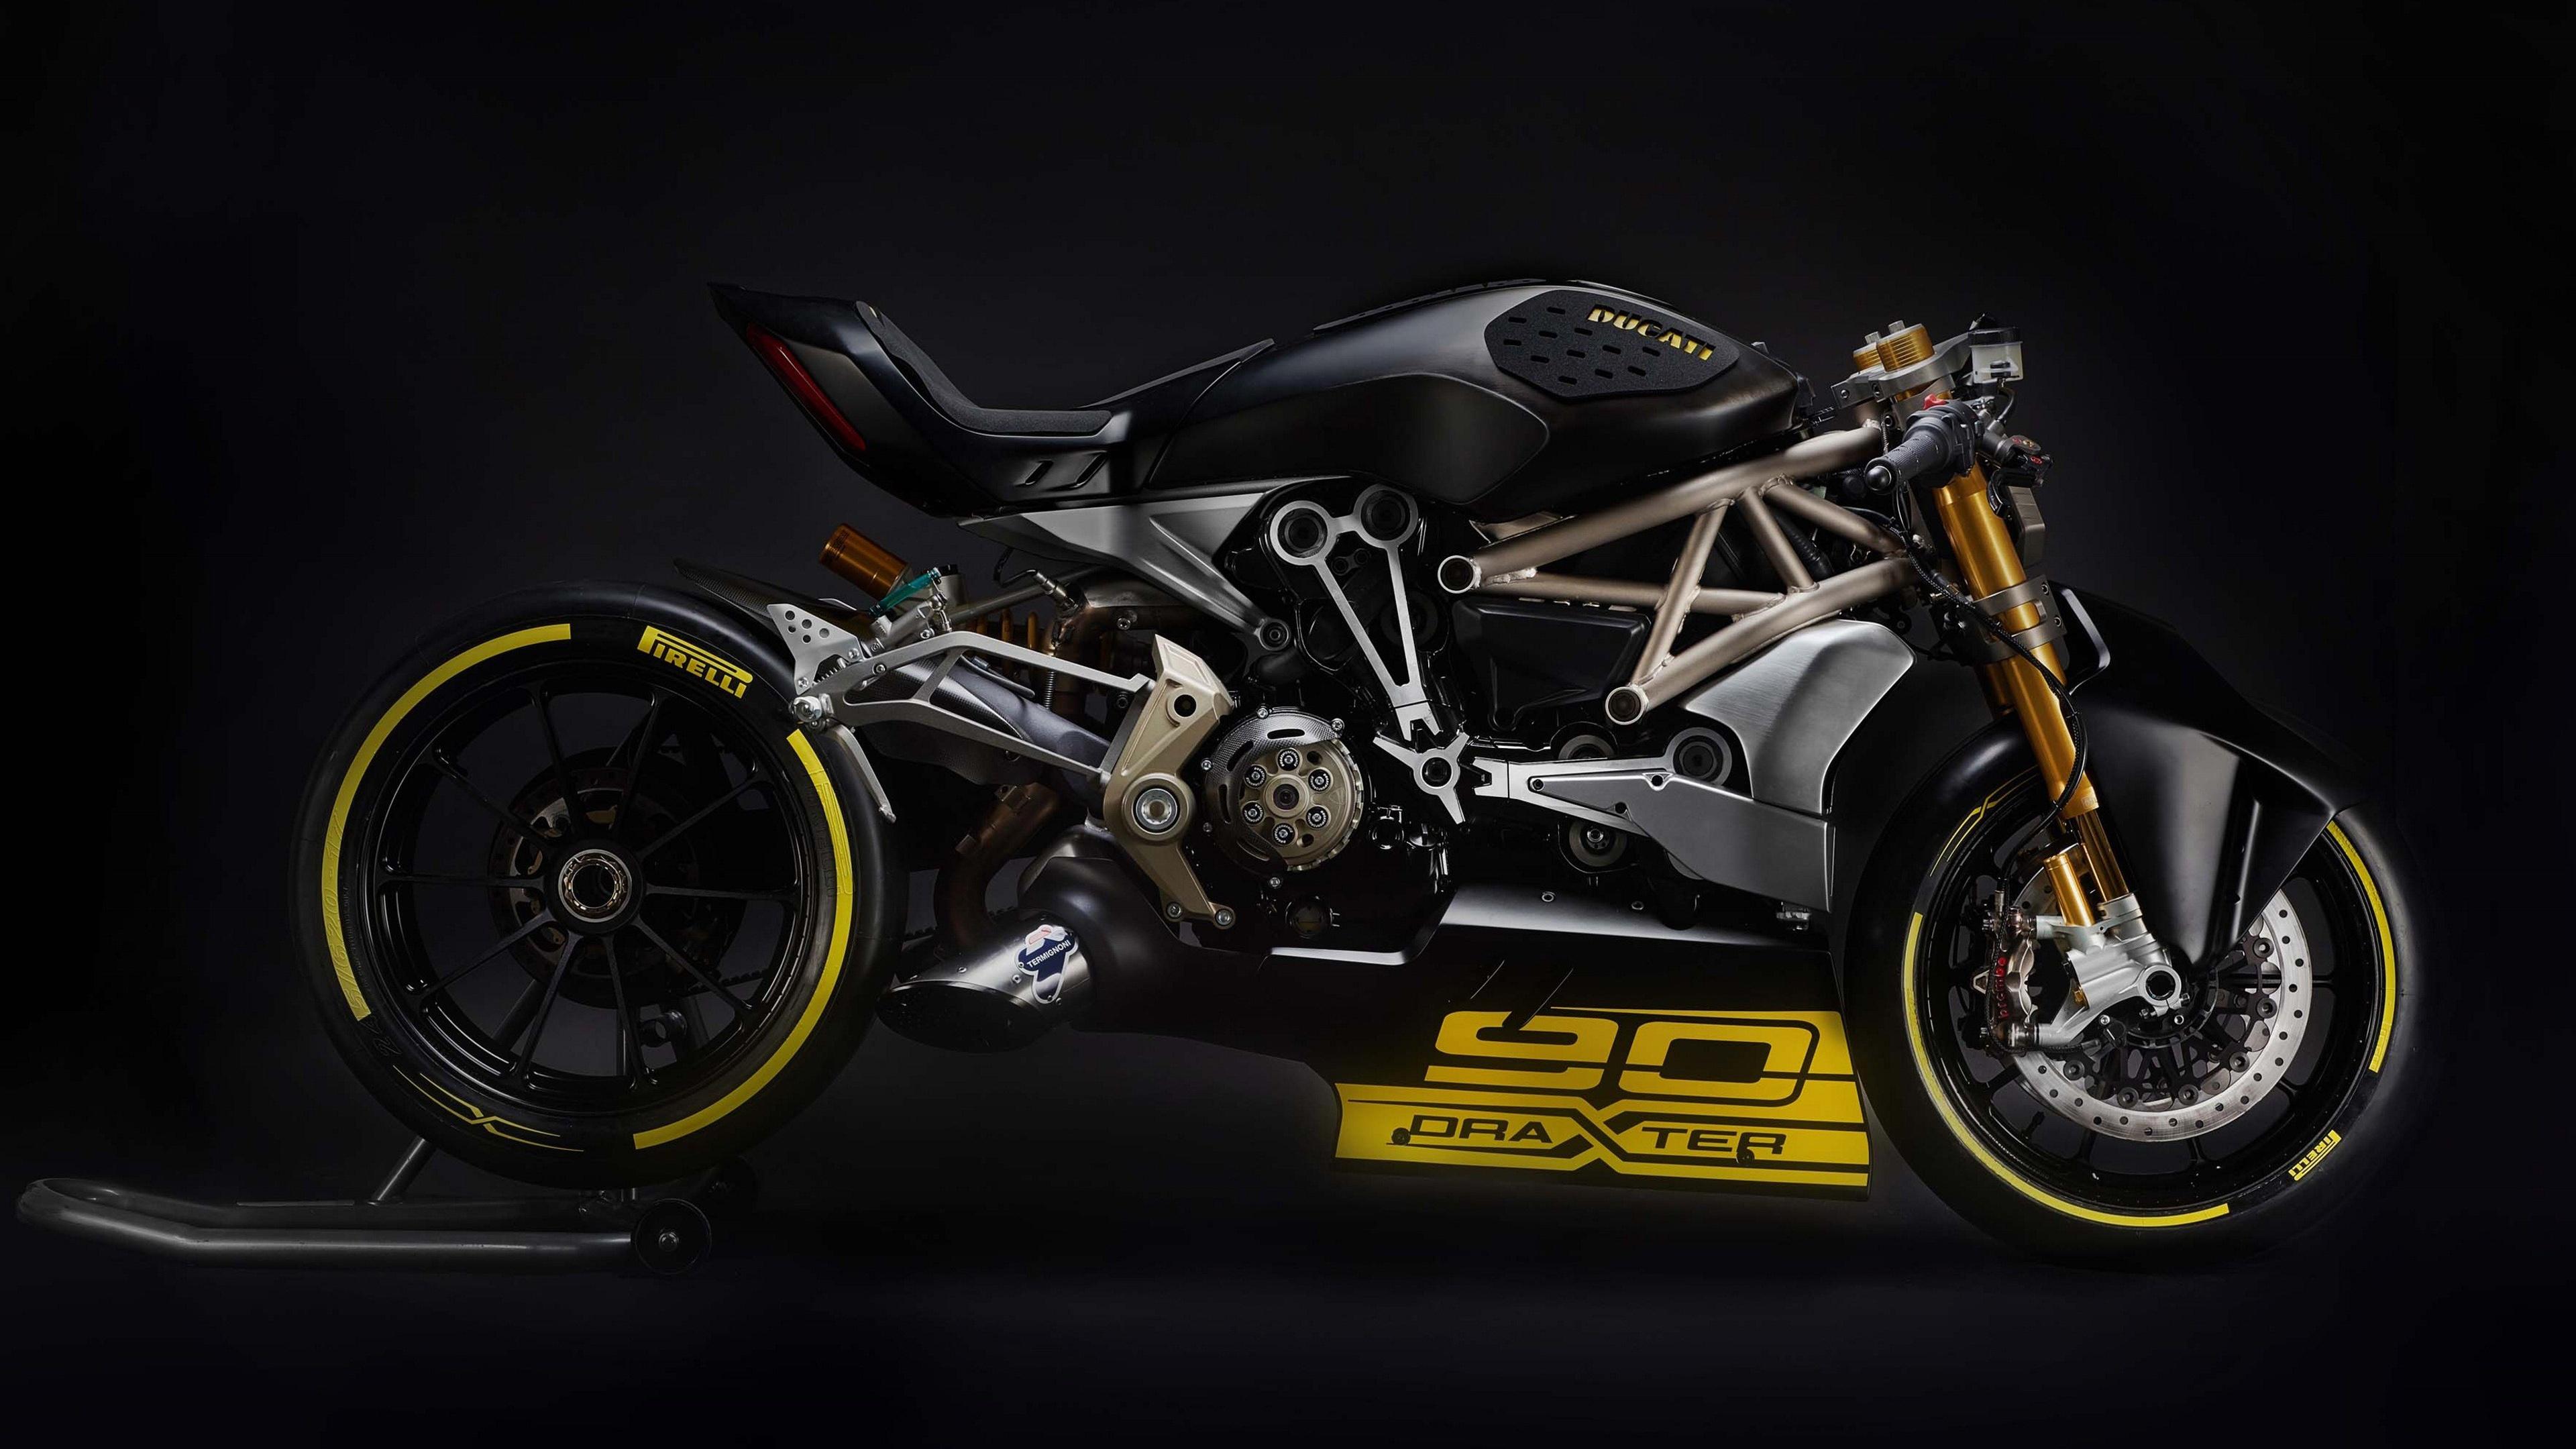 Concept moto бесплатно